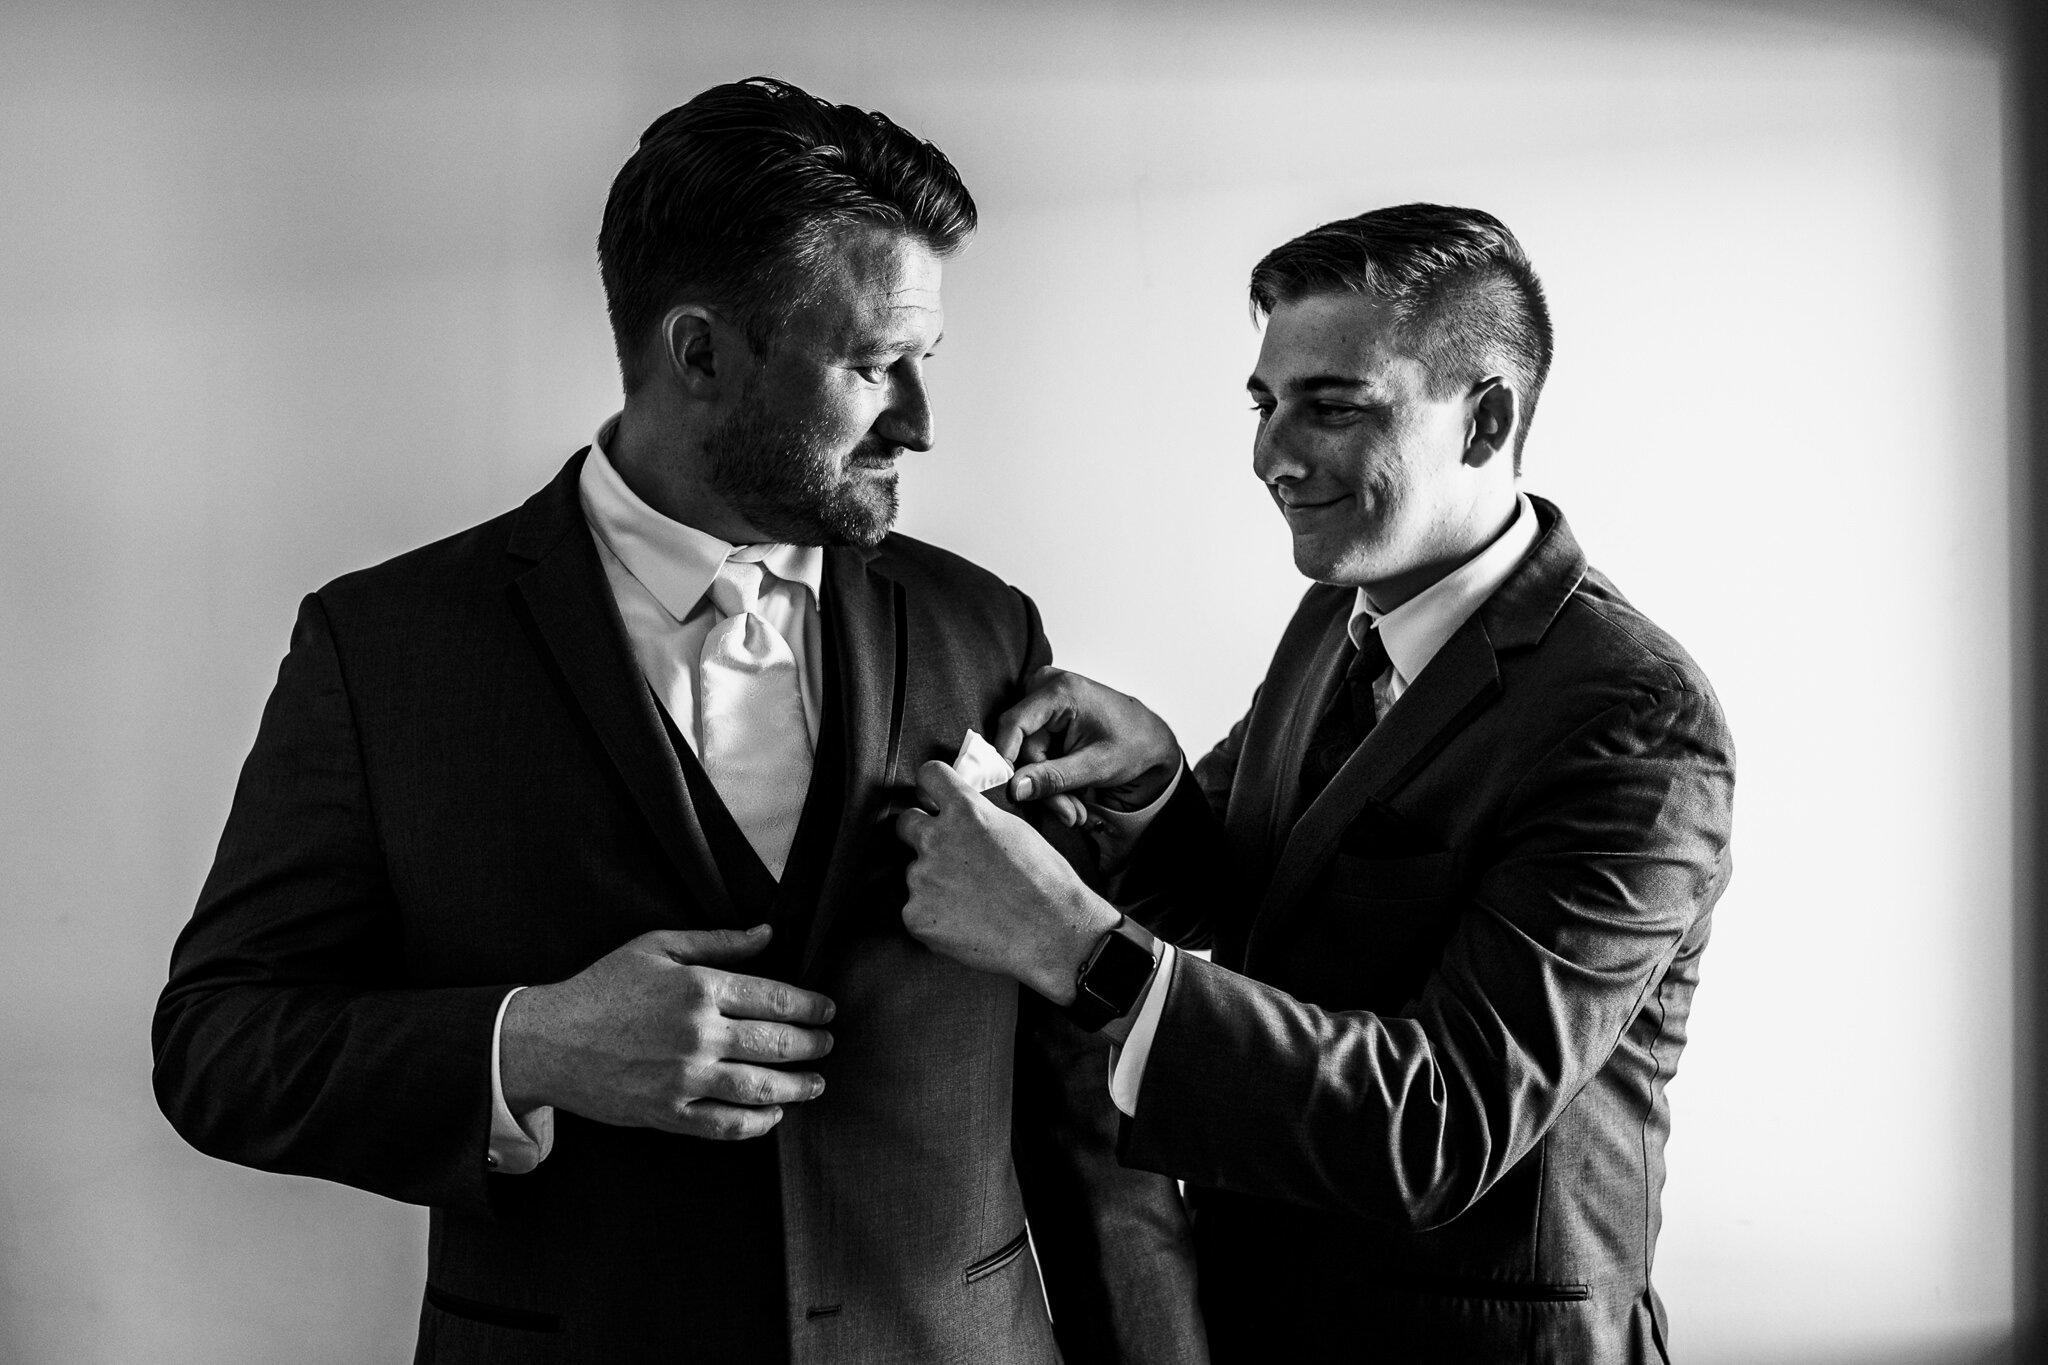 Coyle-Forsgate-Country-Club-Wedding-Photographer-07.JPG